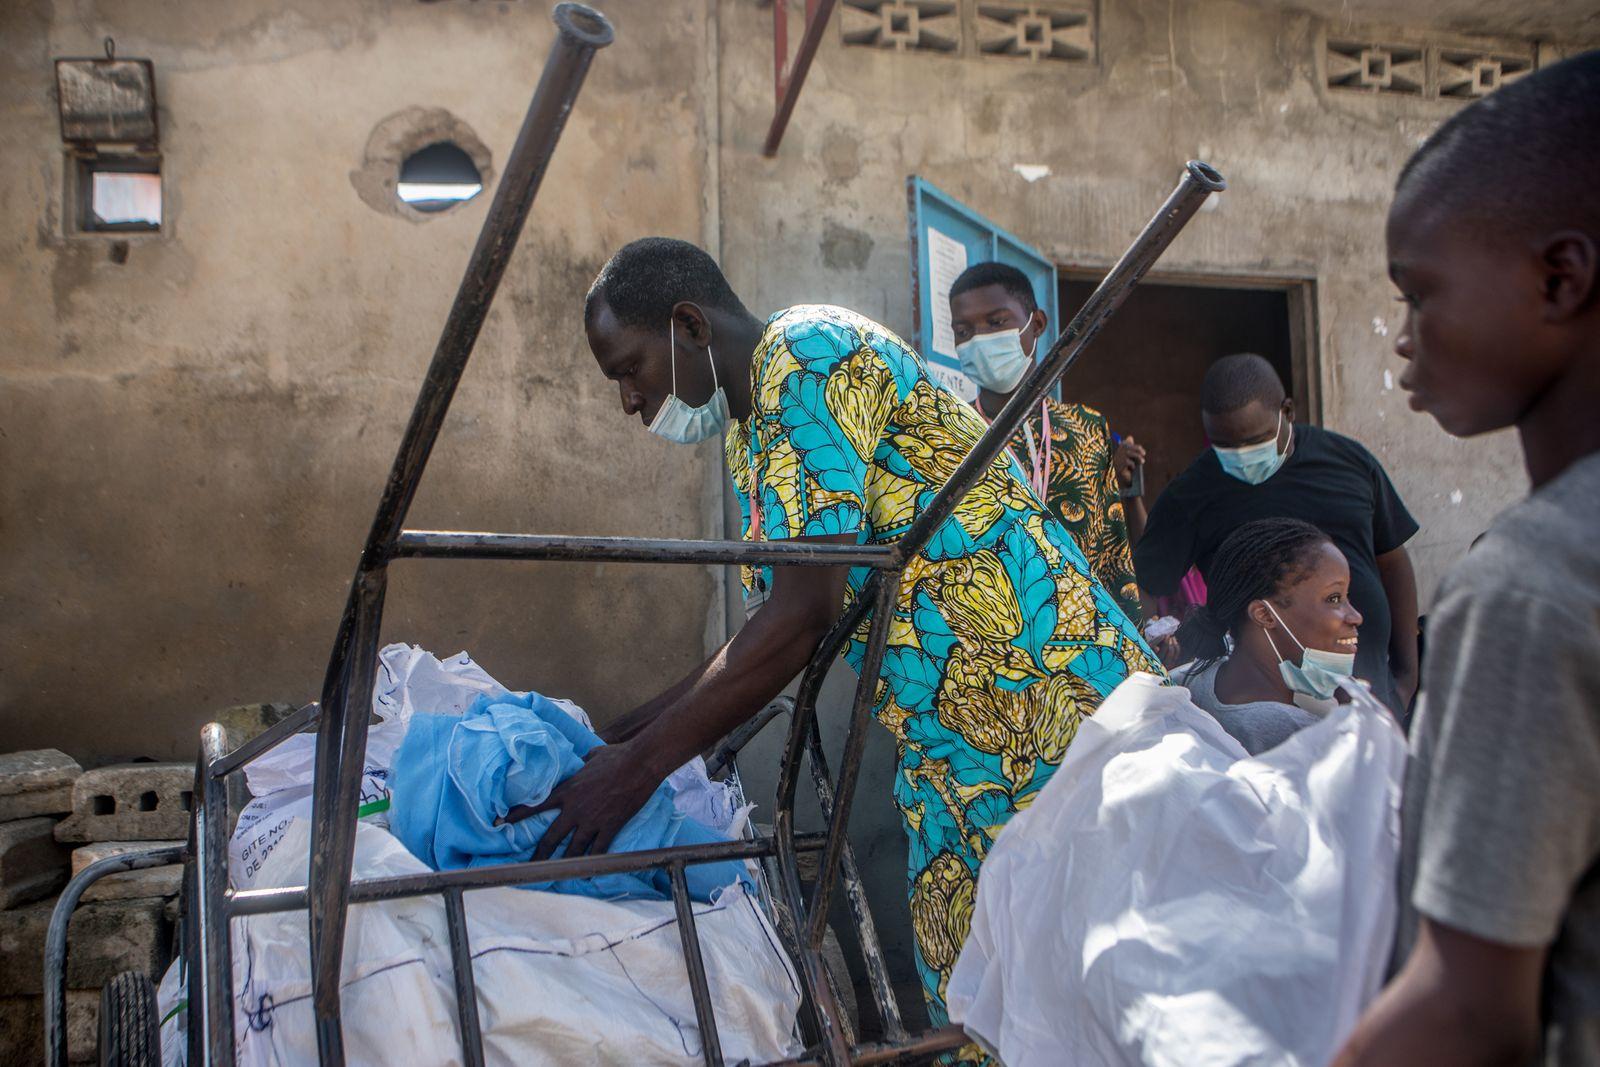 BENIN-HEALTH-VIRUS-MALARIA